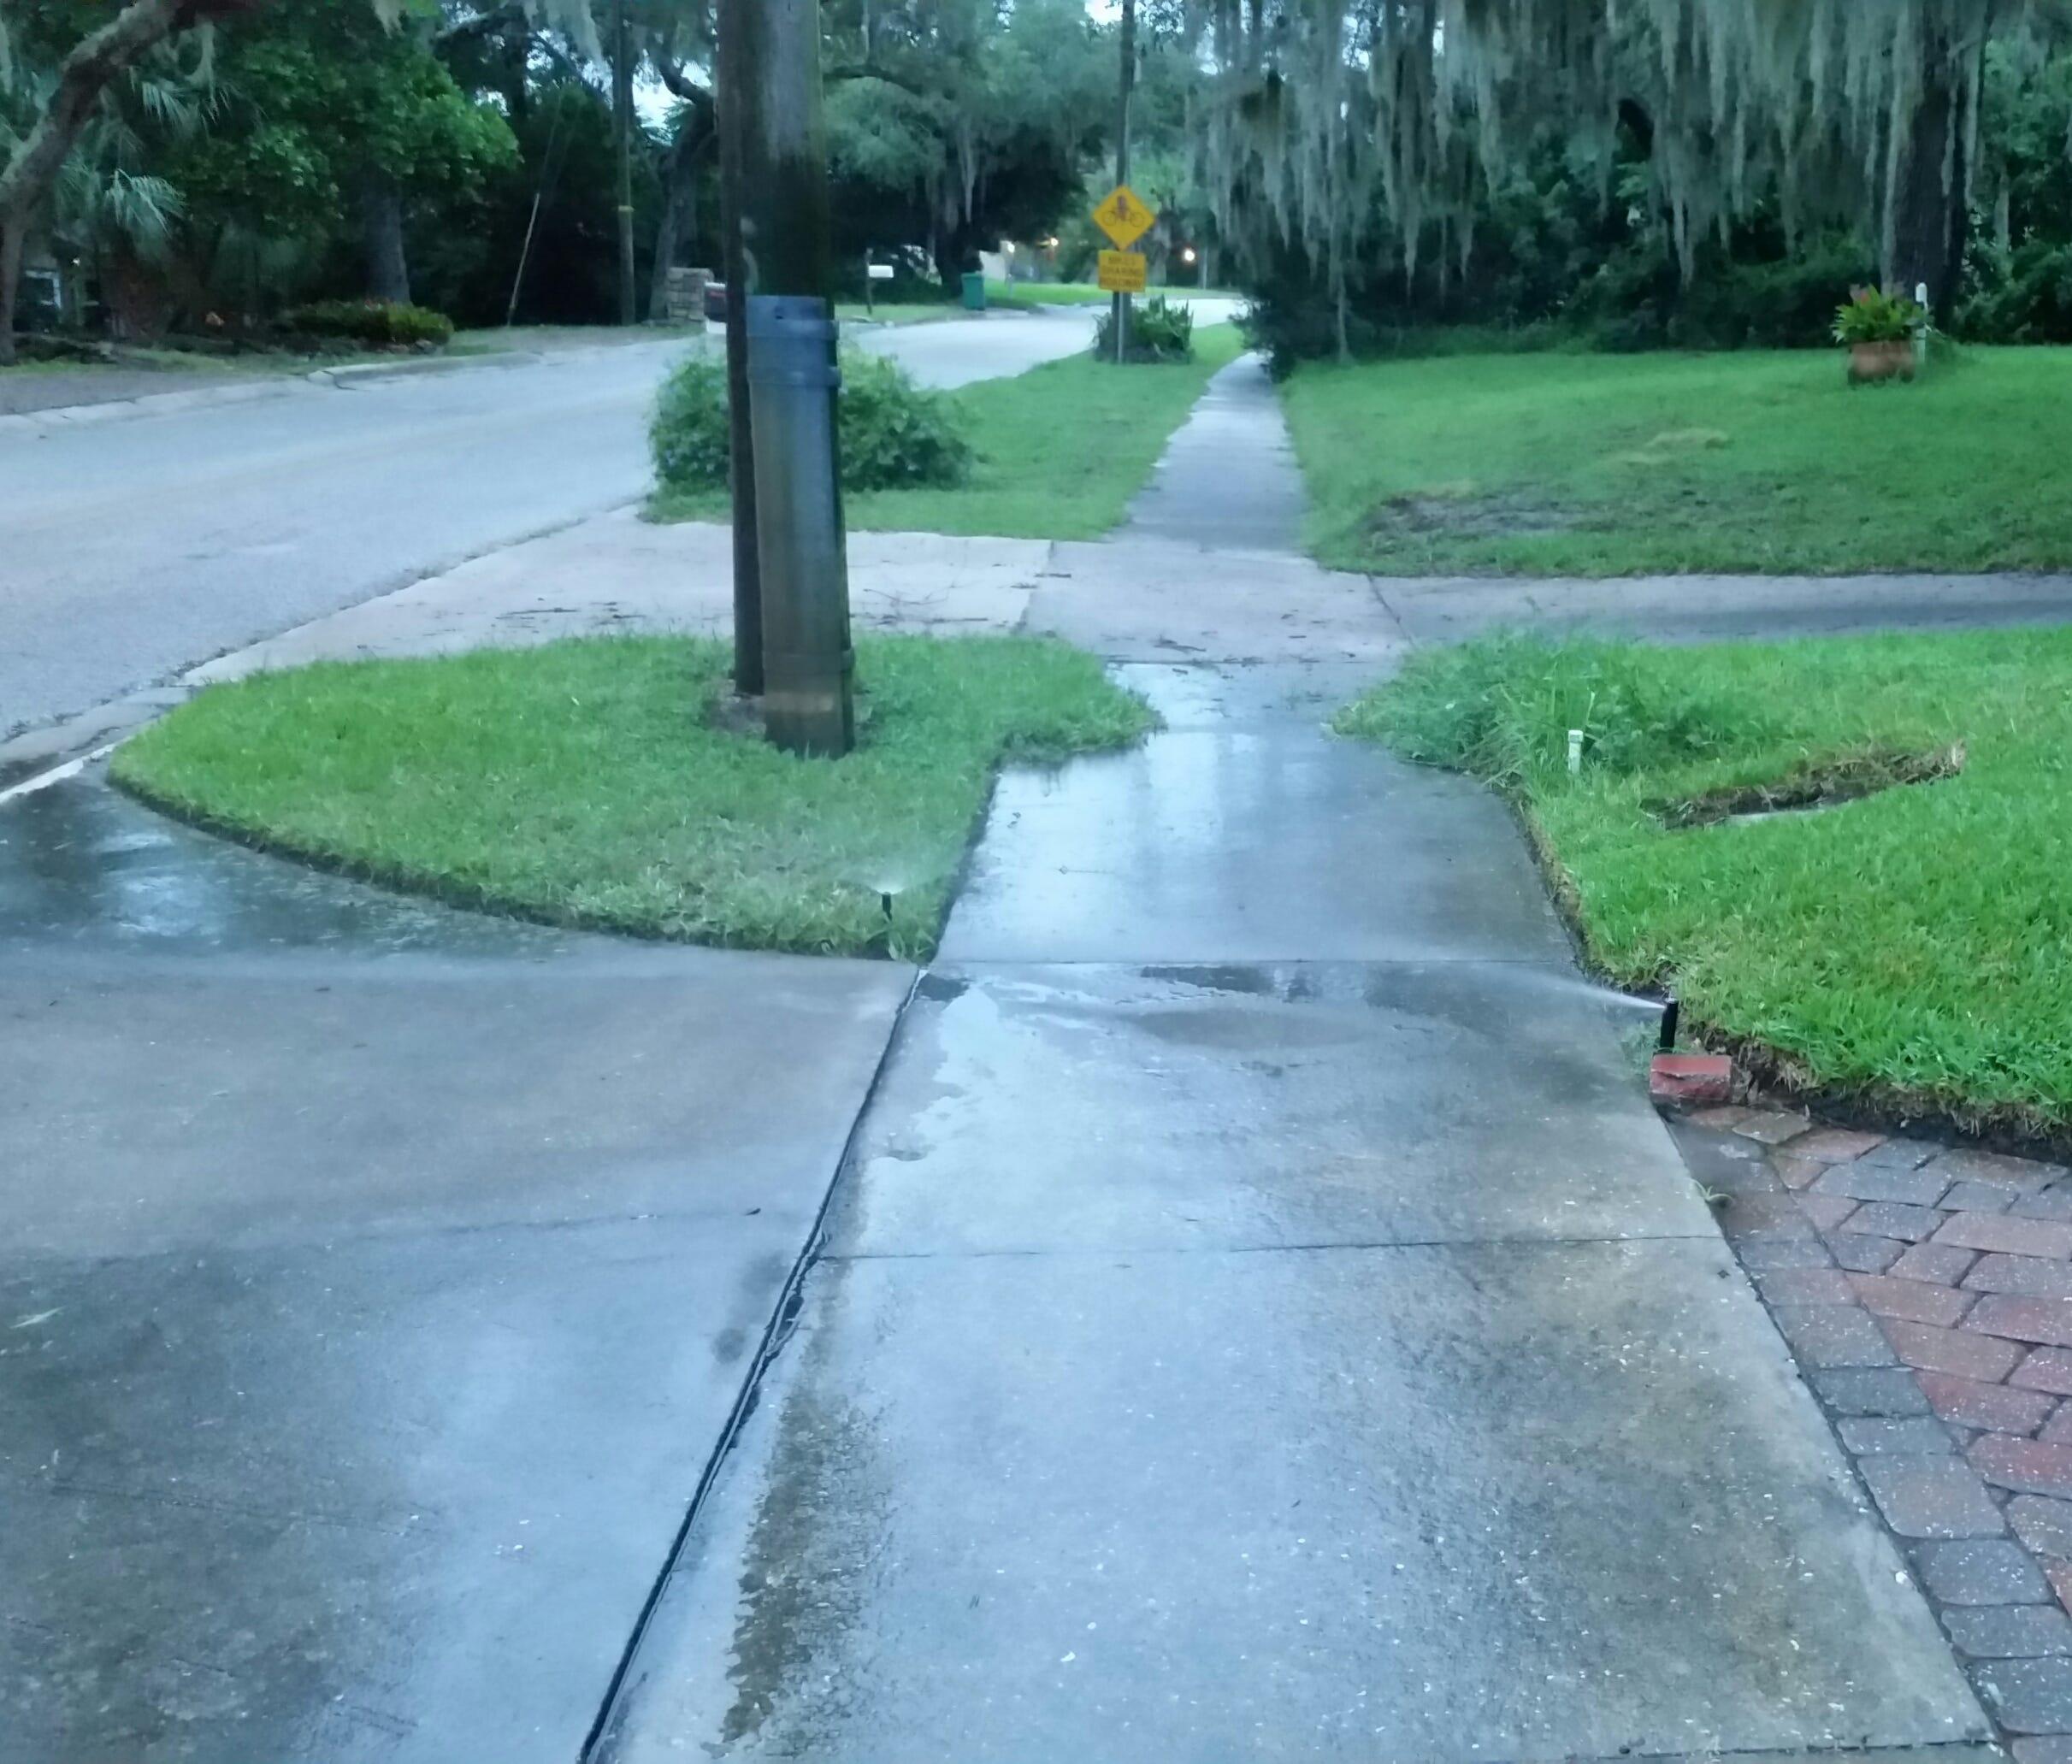 636514333134871813-irrigation-watering-the-sidewalk---Copy Watering Plants Efficiently